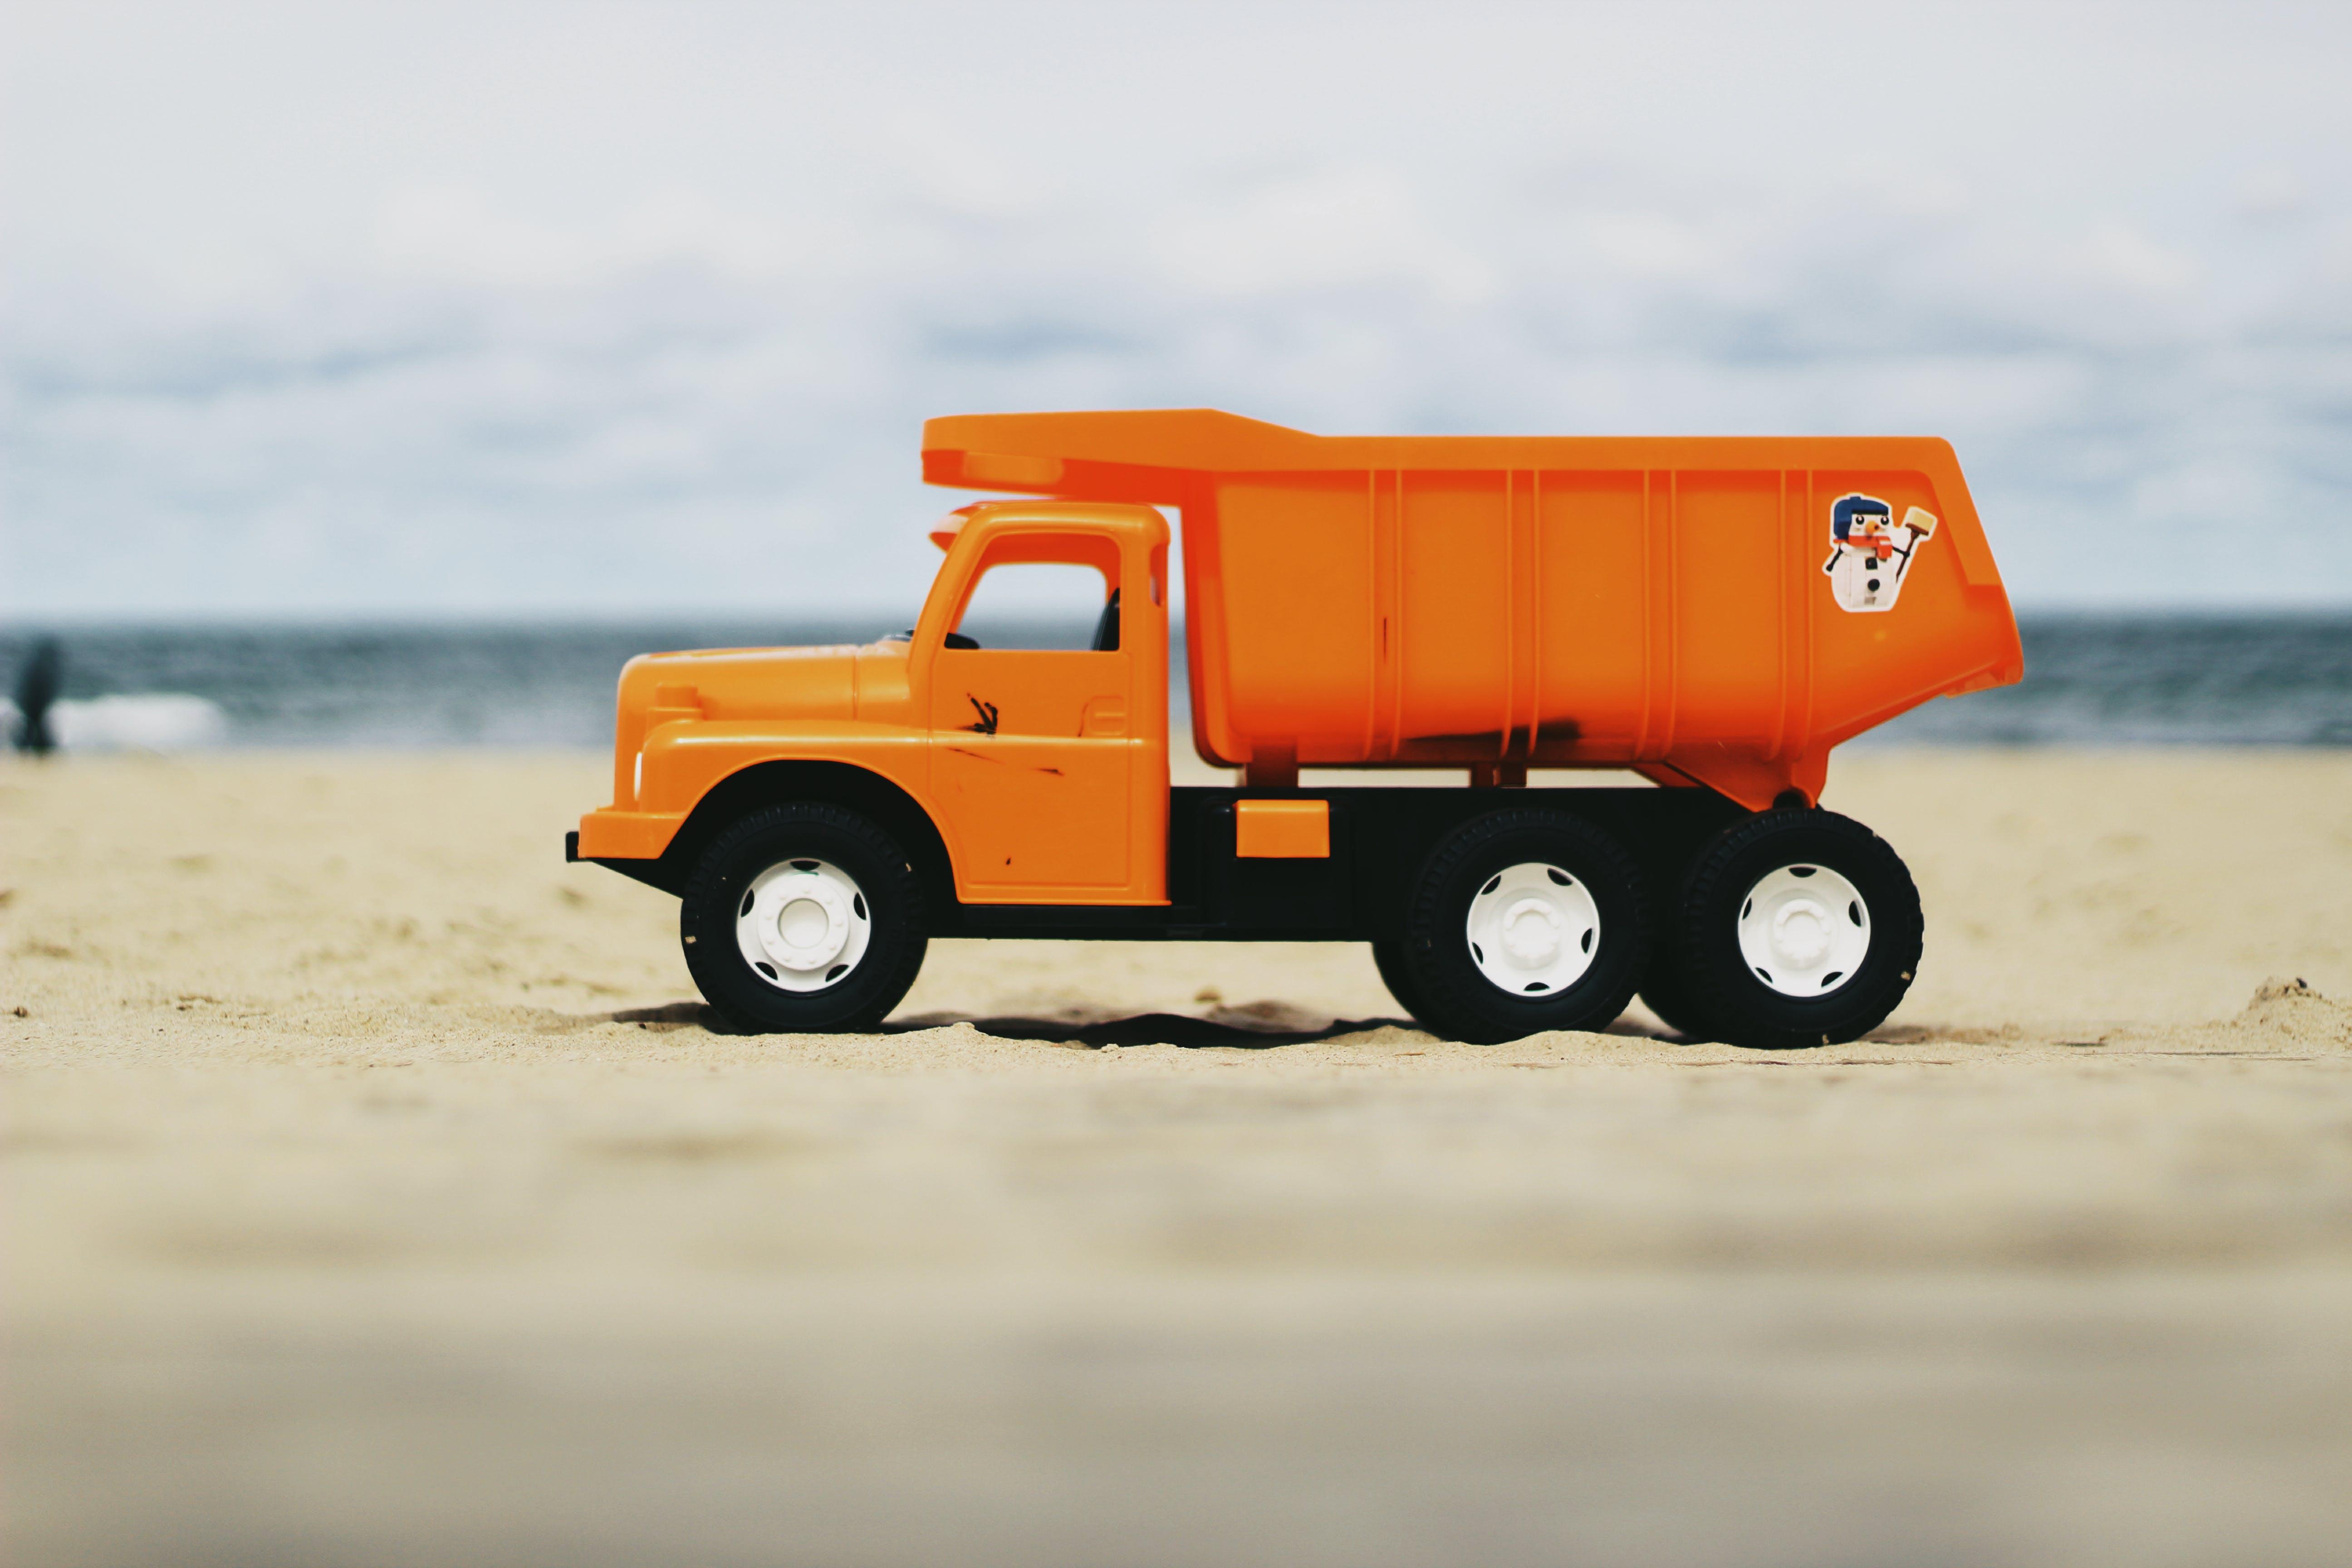 Photo of Orange Dump Truck Toy